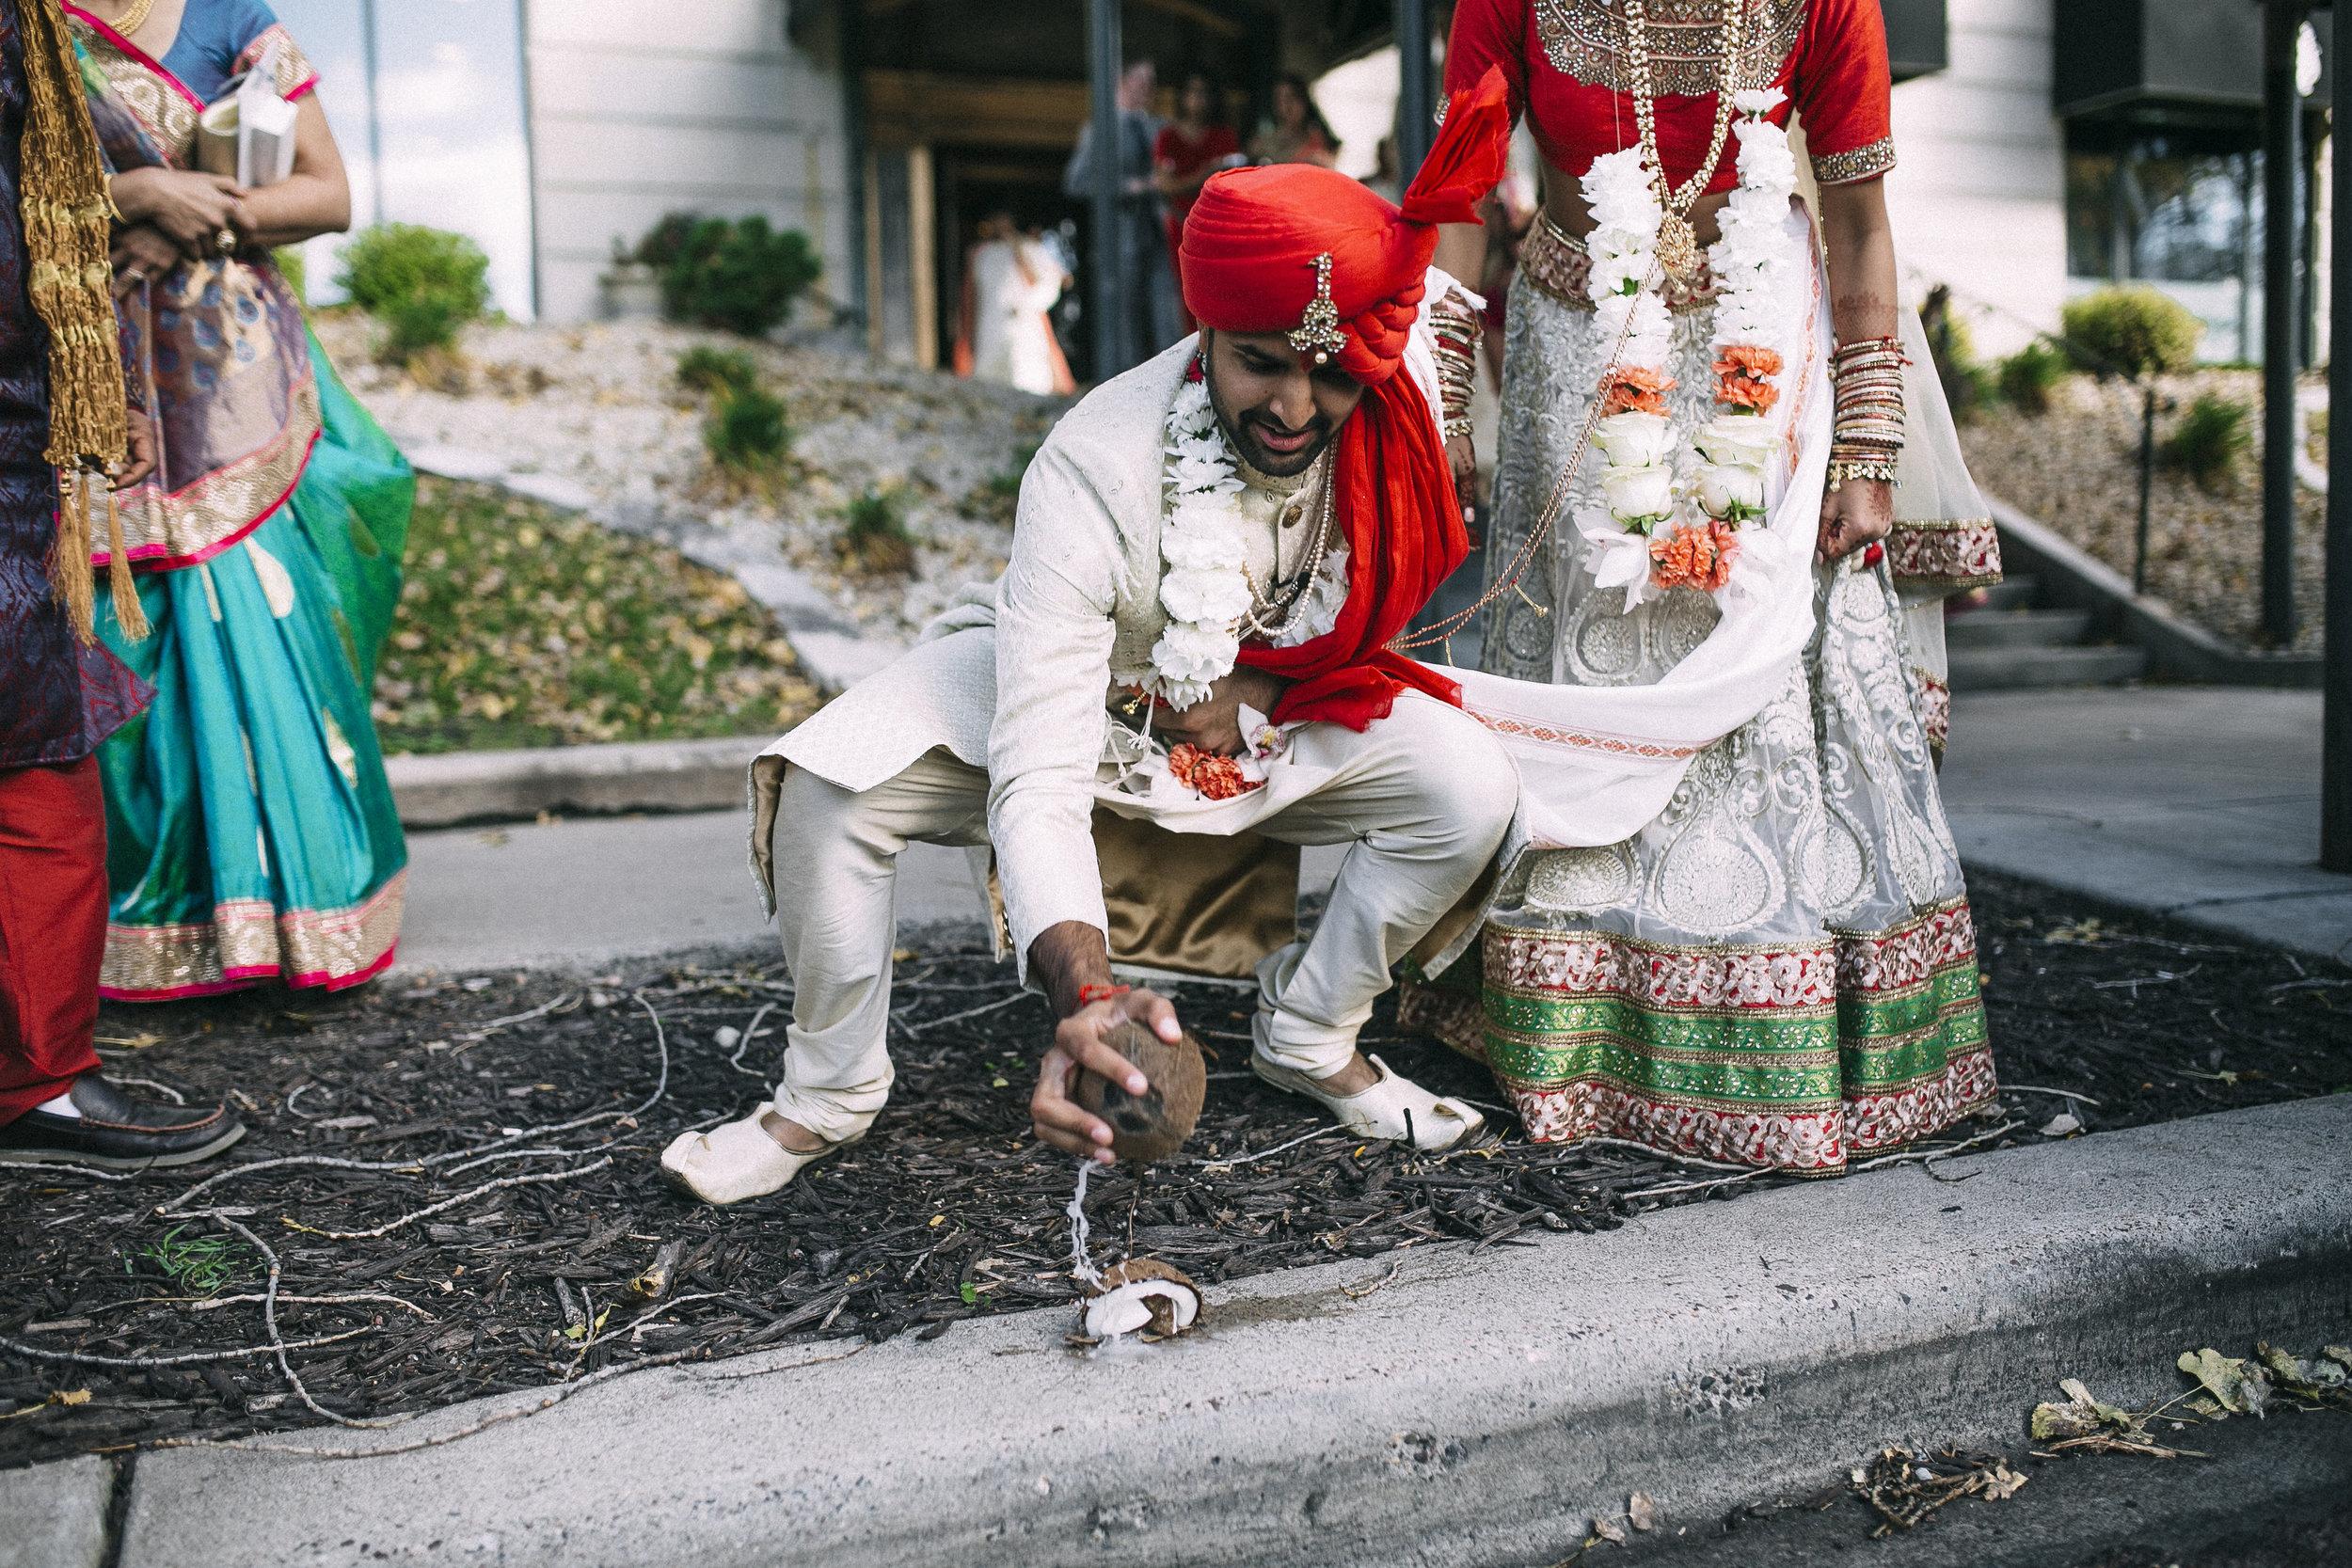 Acowsay_Minnesota_Wedding_Video_Tradition.JPG